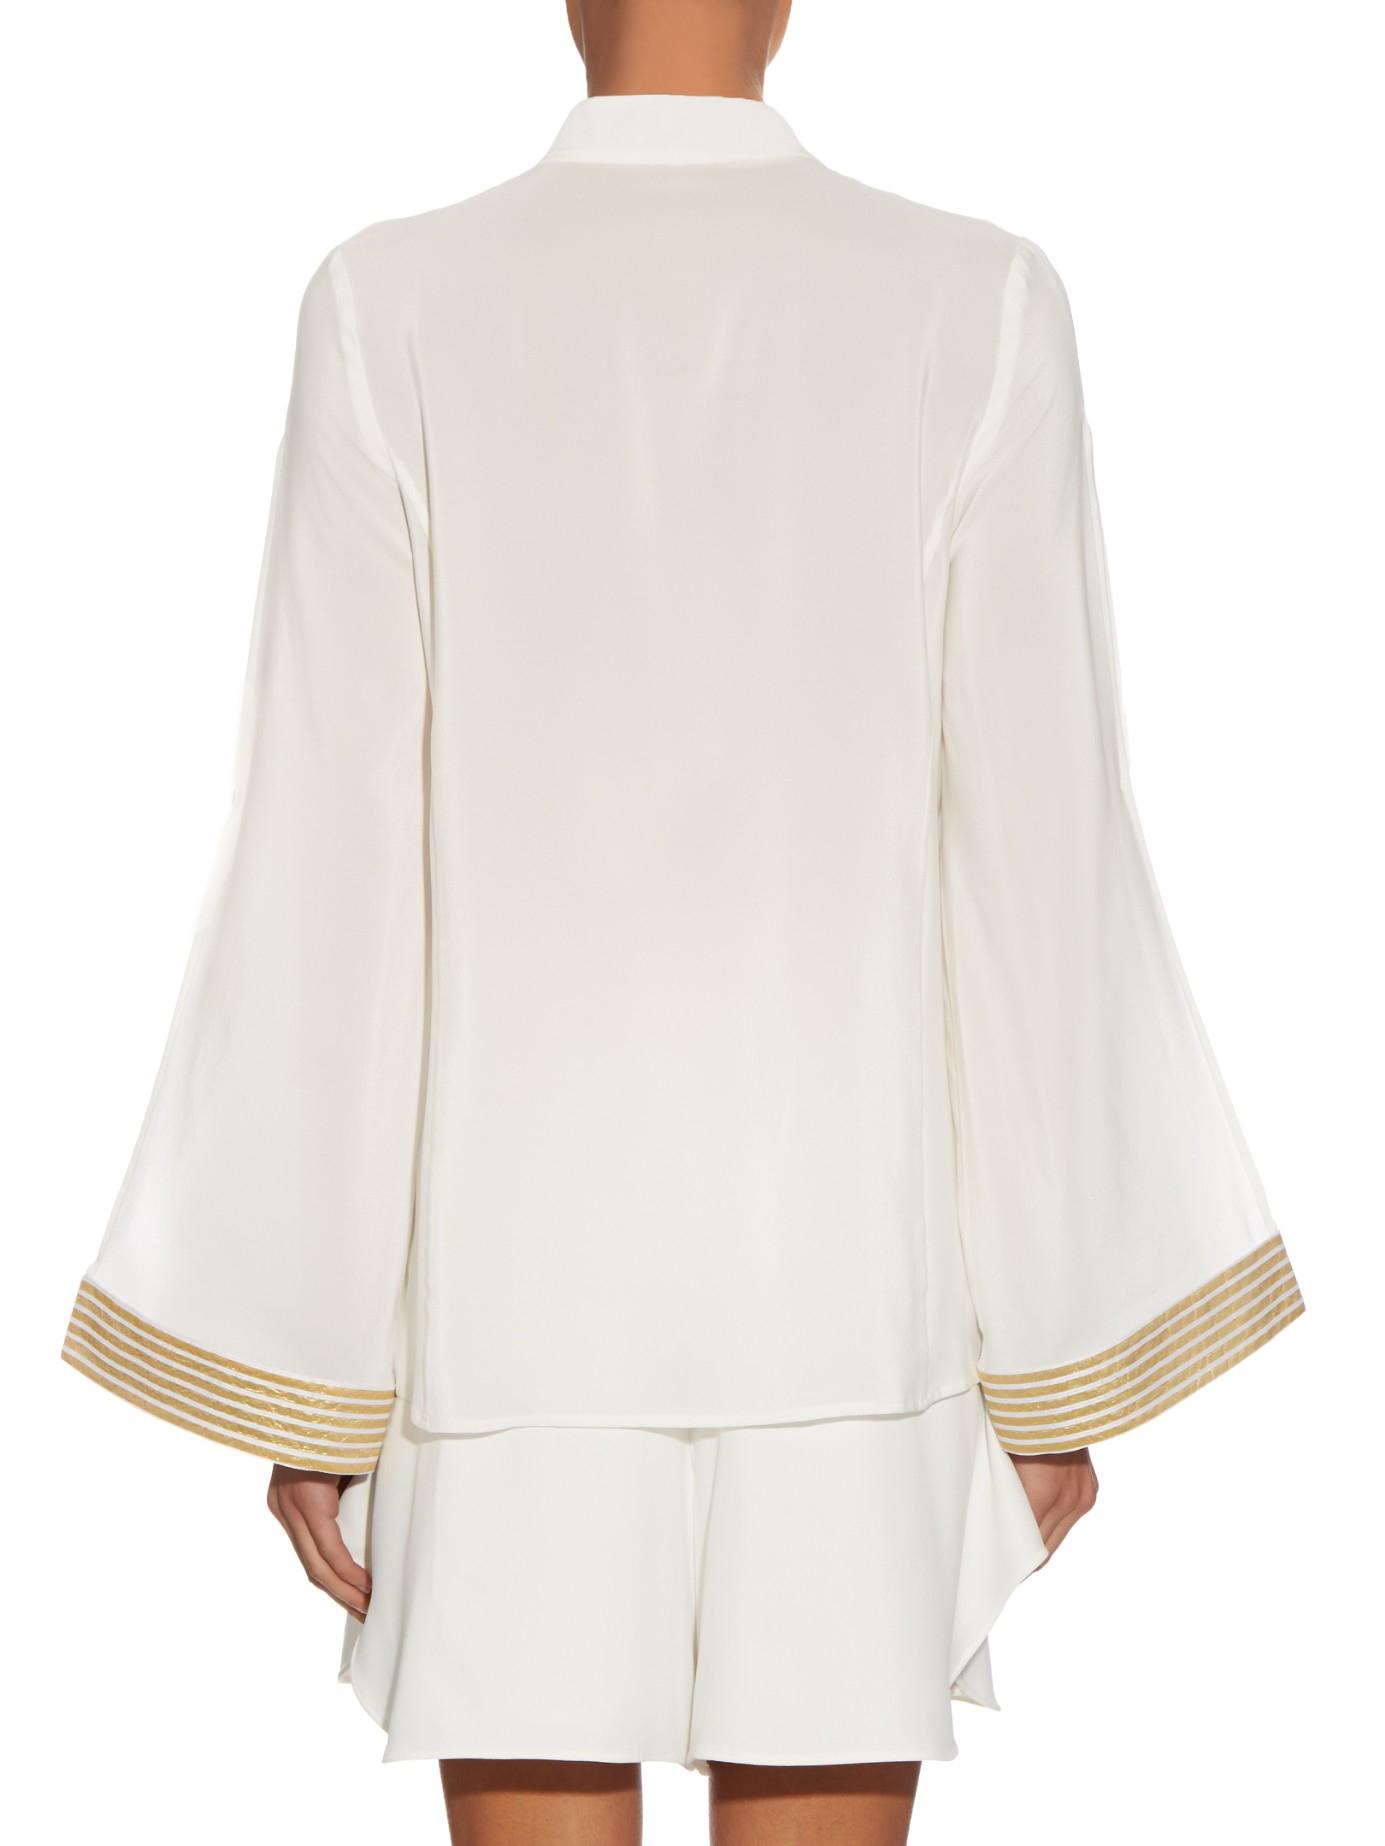 Silk Crepe De Chine Blouse Zeus + Dione Fashionable Cheap Newest Sale View Websites Online Clearance Pictures OuFWgN